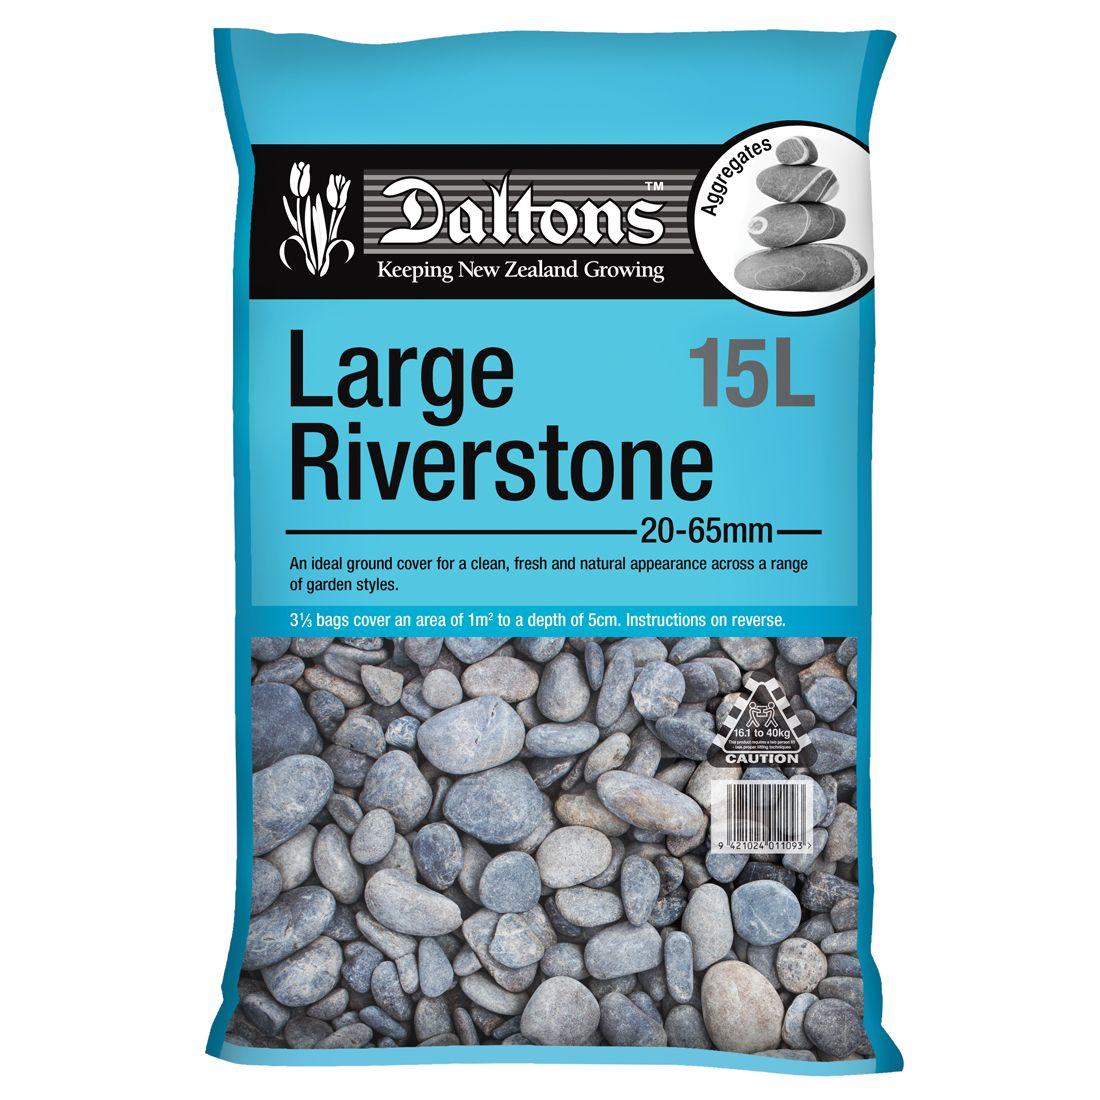 Large Riverstone 15L Bag